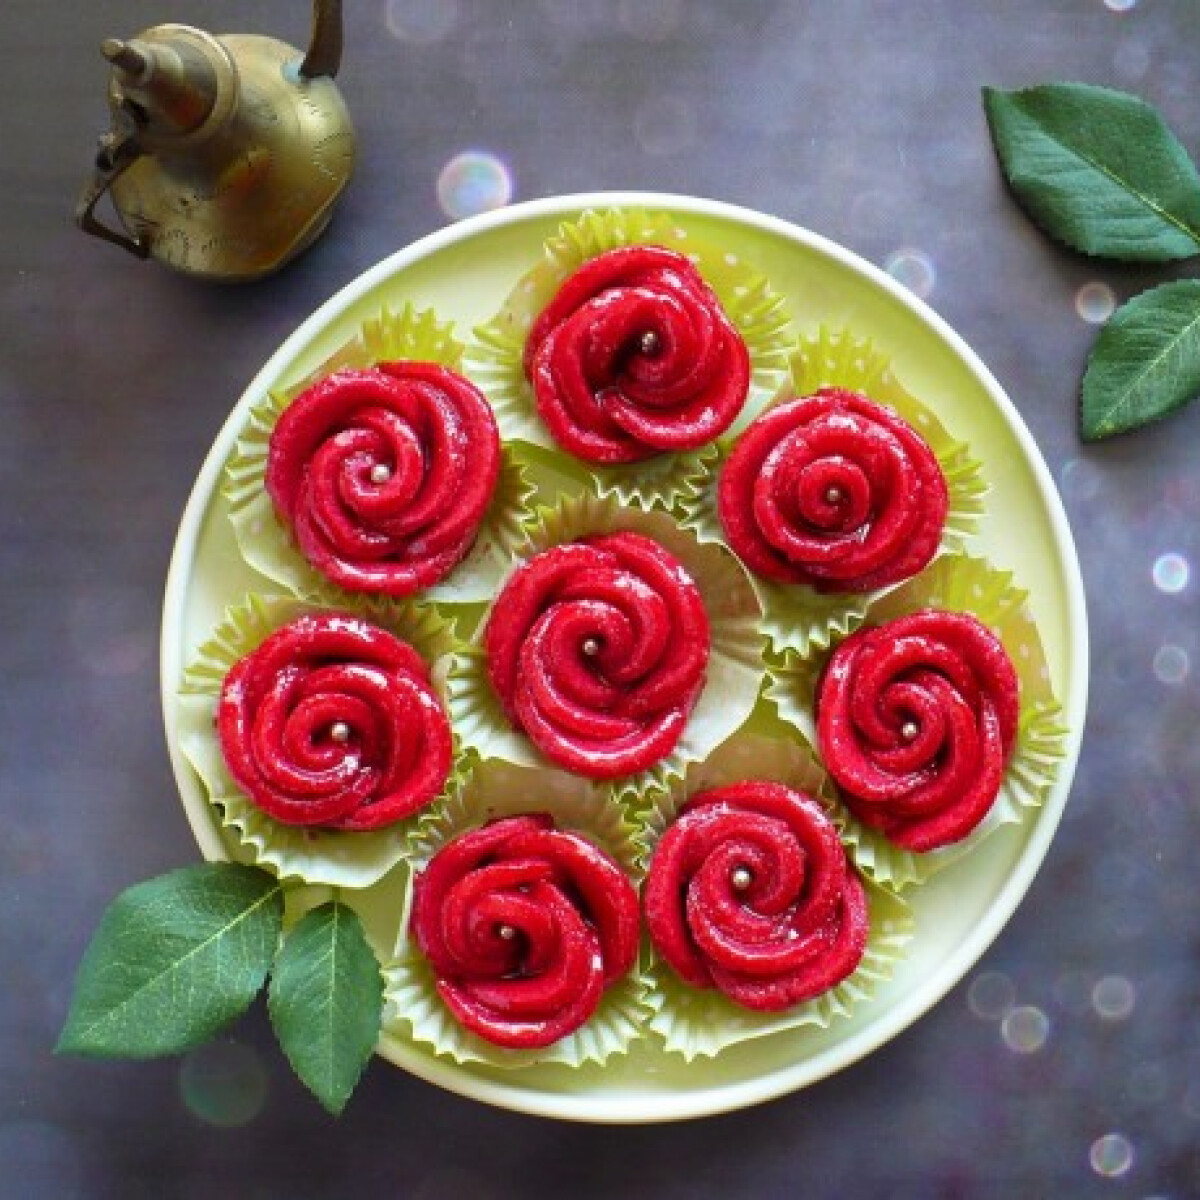 Gül baba rózsái